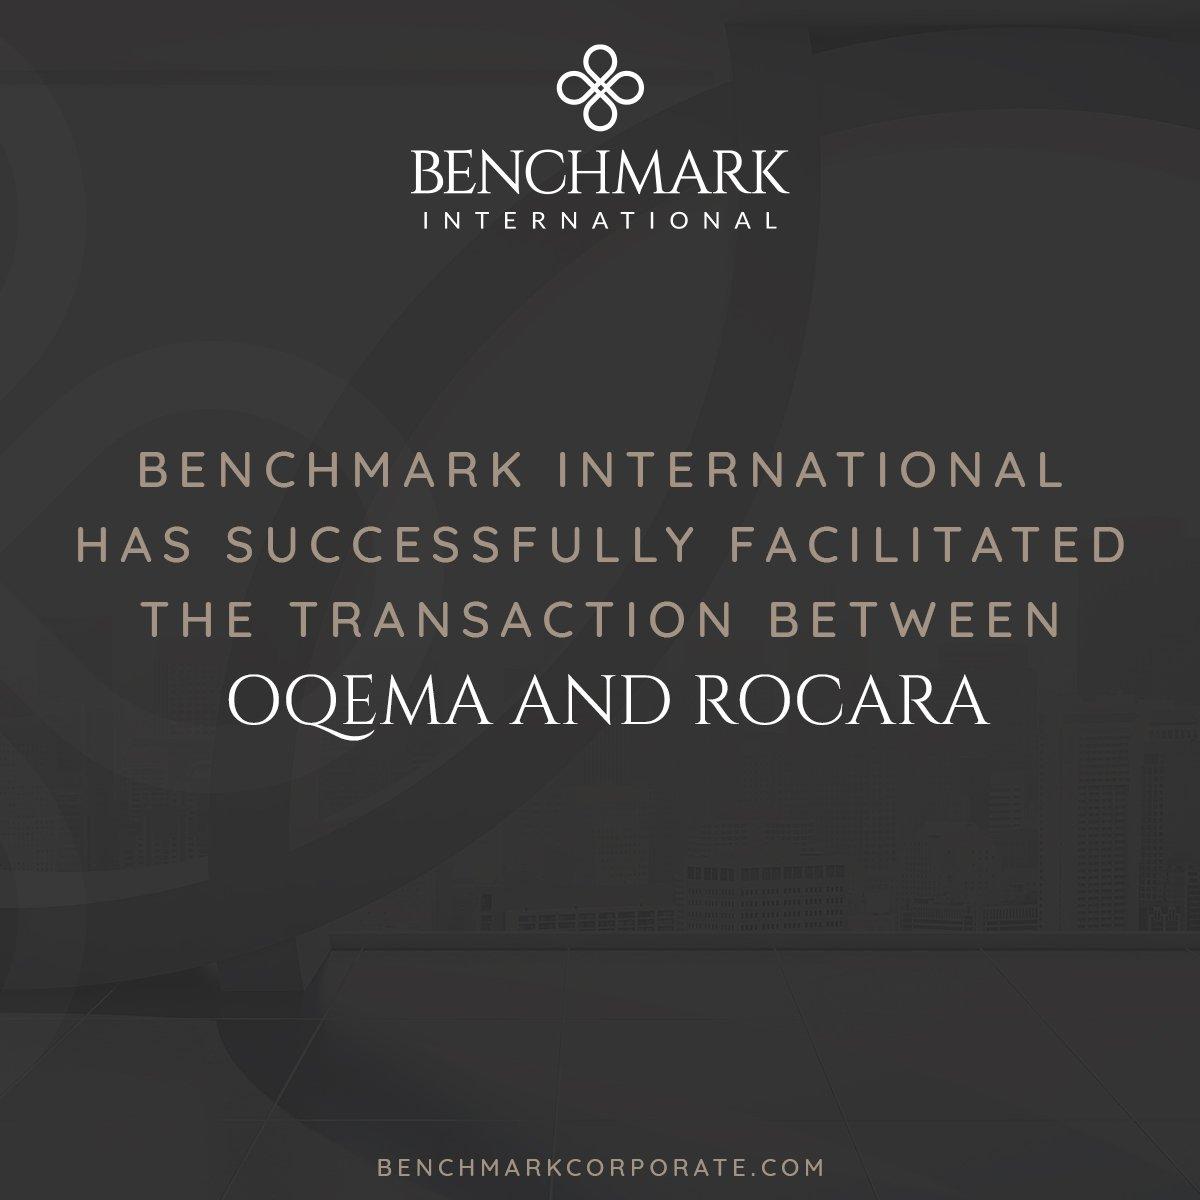 OQEMA Acquires Rocara